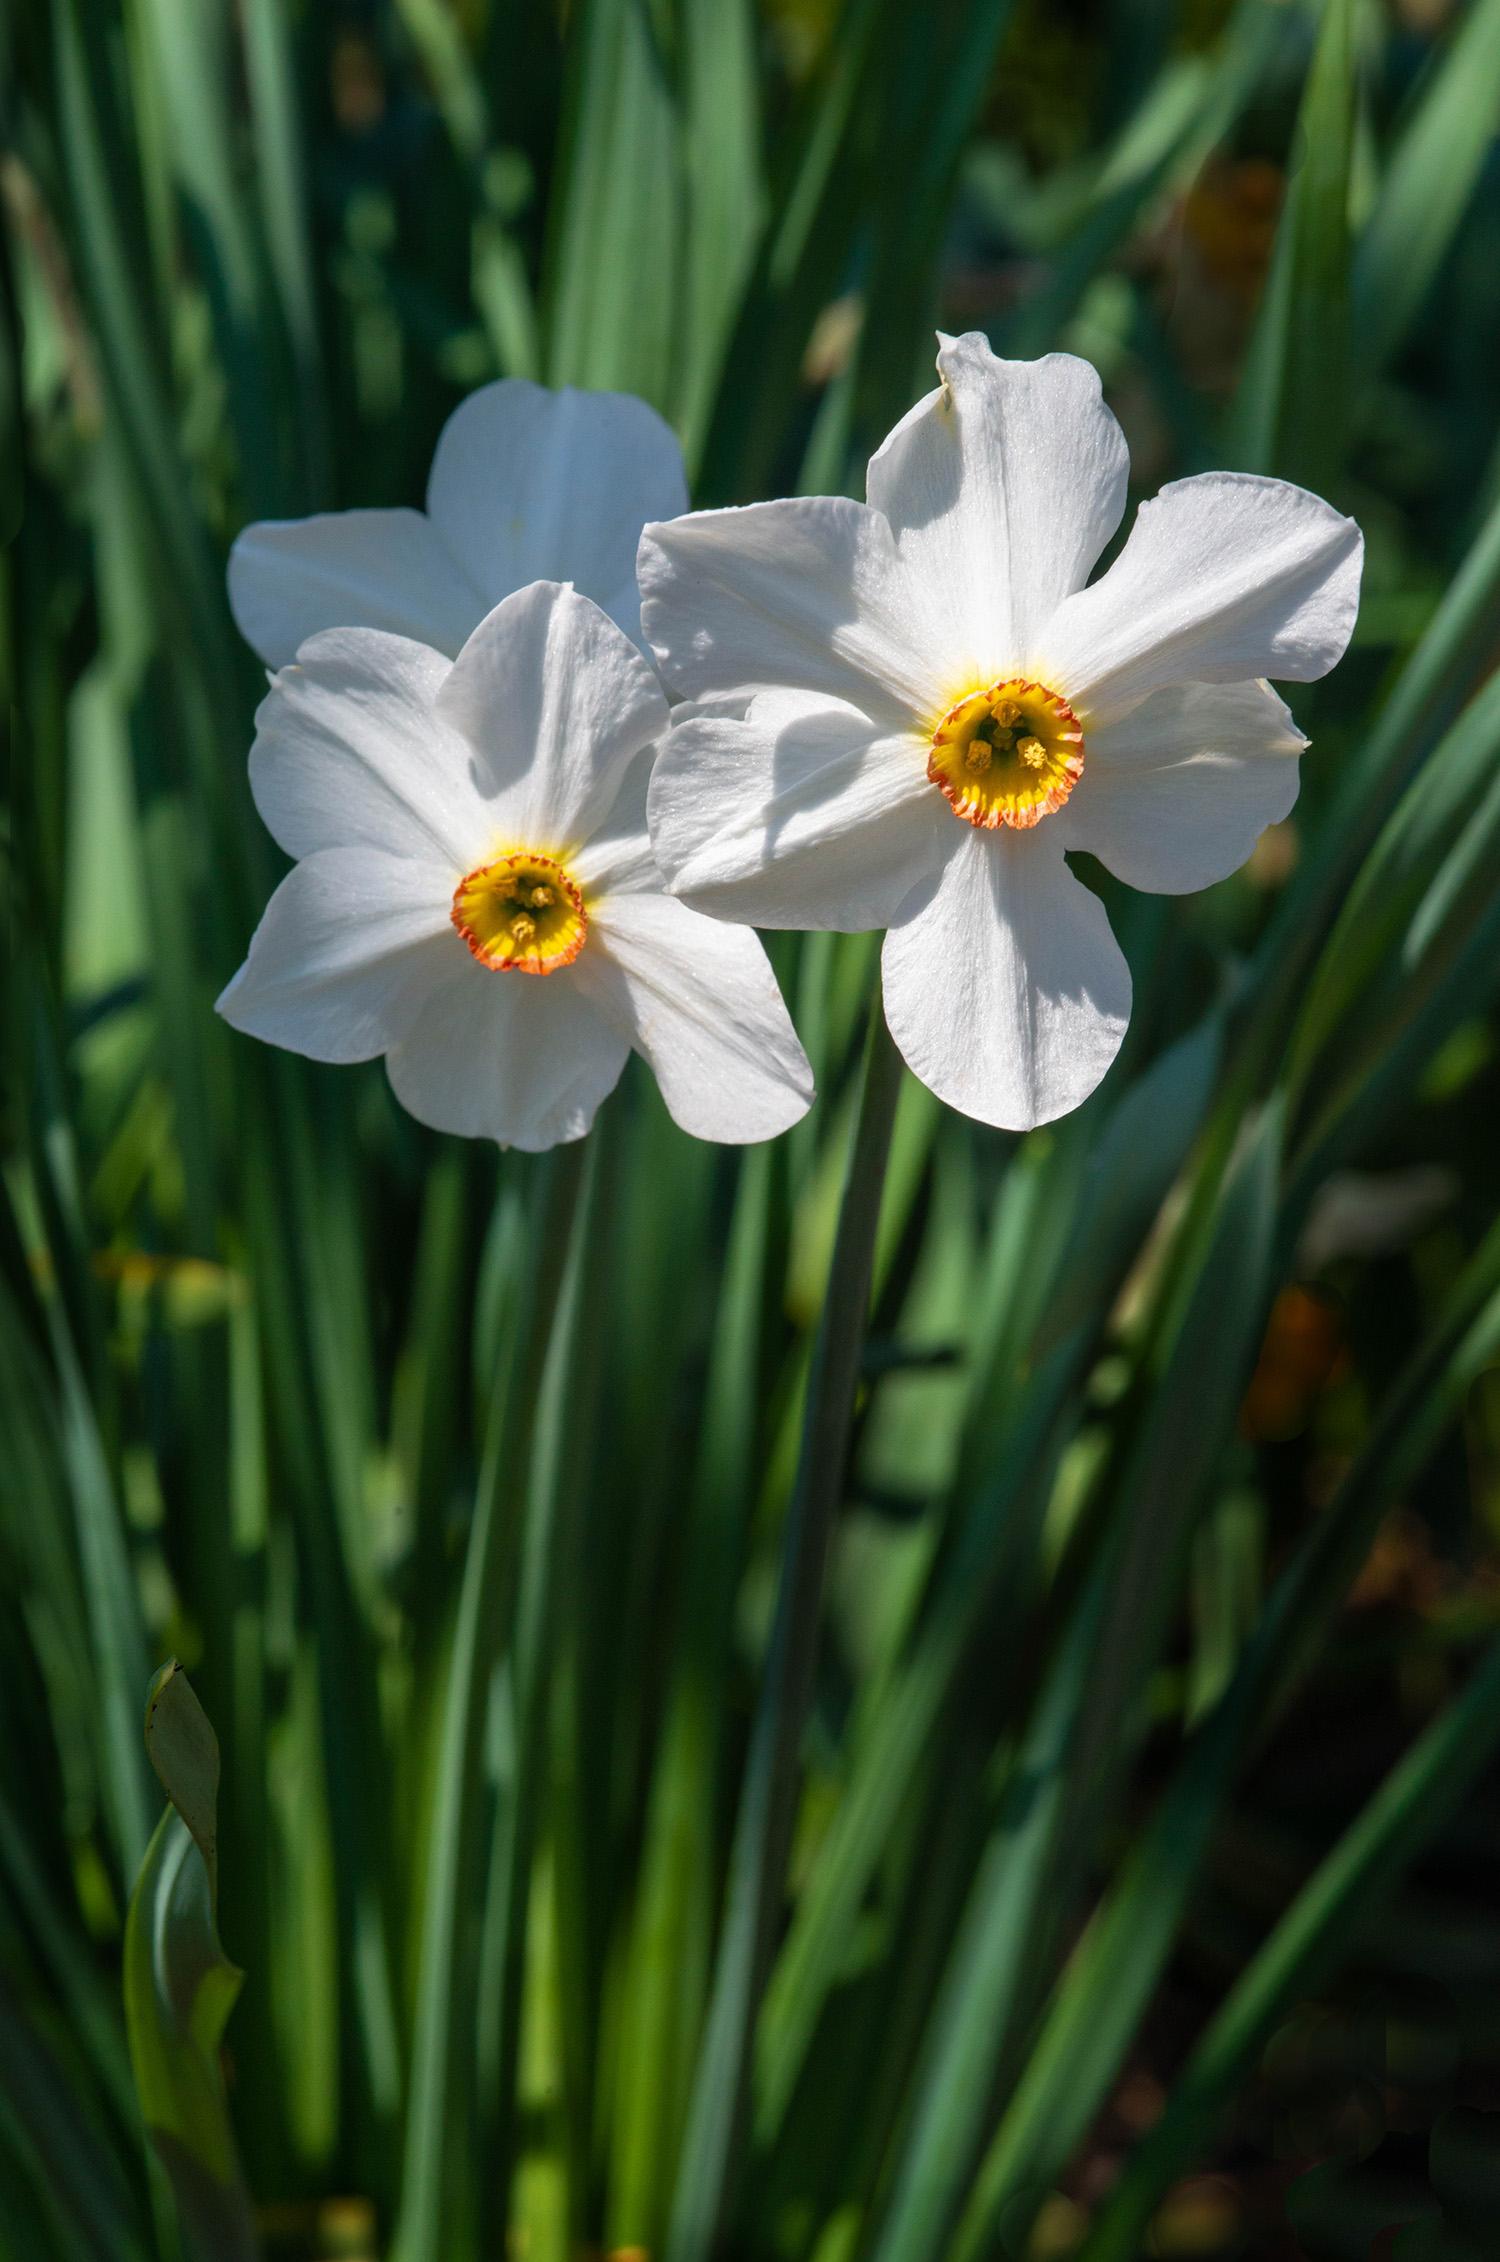 #daffodils, #flowers, #spring, #pennsylvania, #beginning, #promise, #nikon